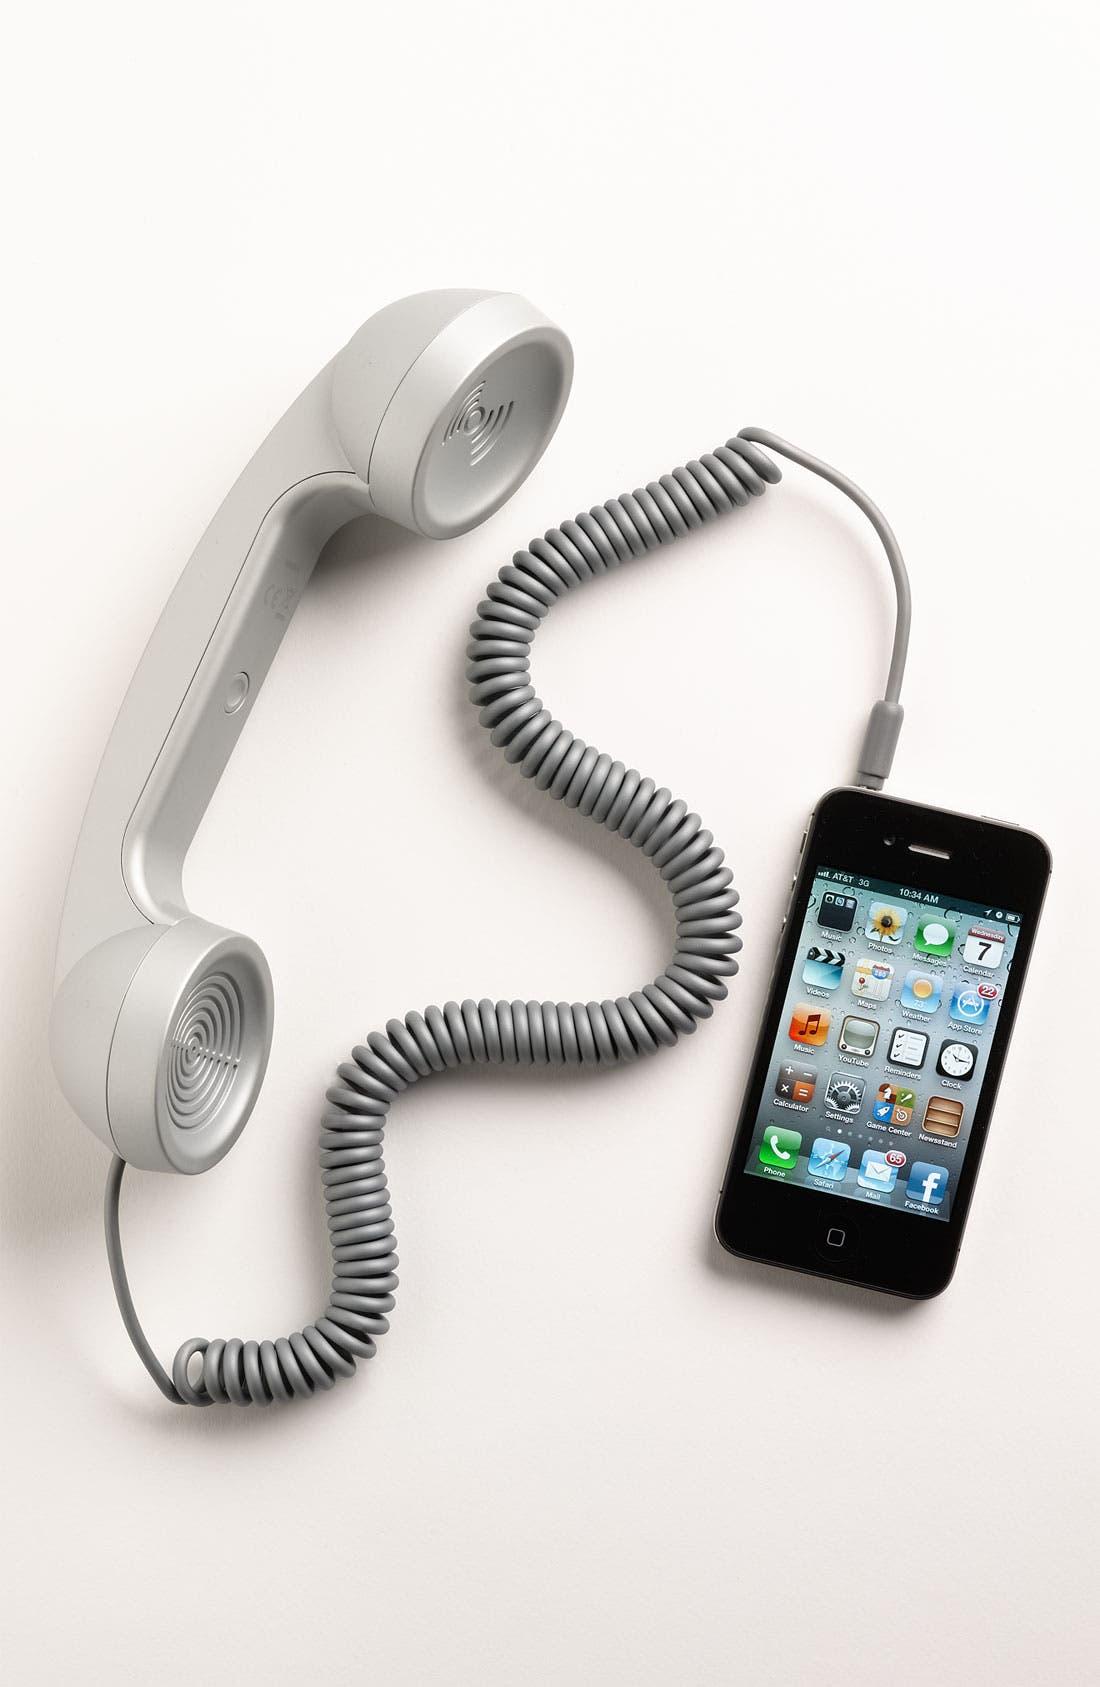 Main Image - Native Union 'Pop Phone' Handset